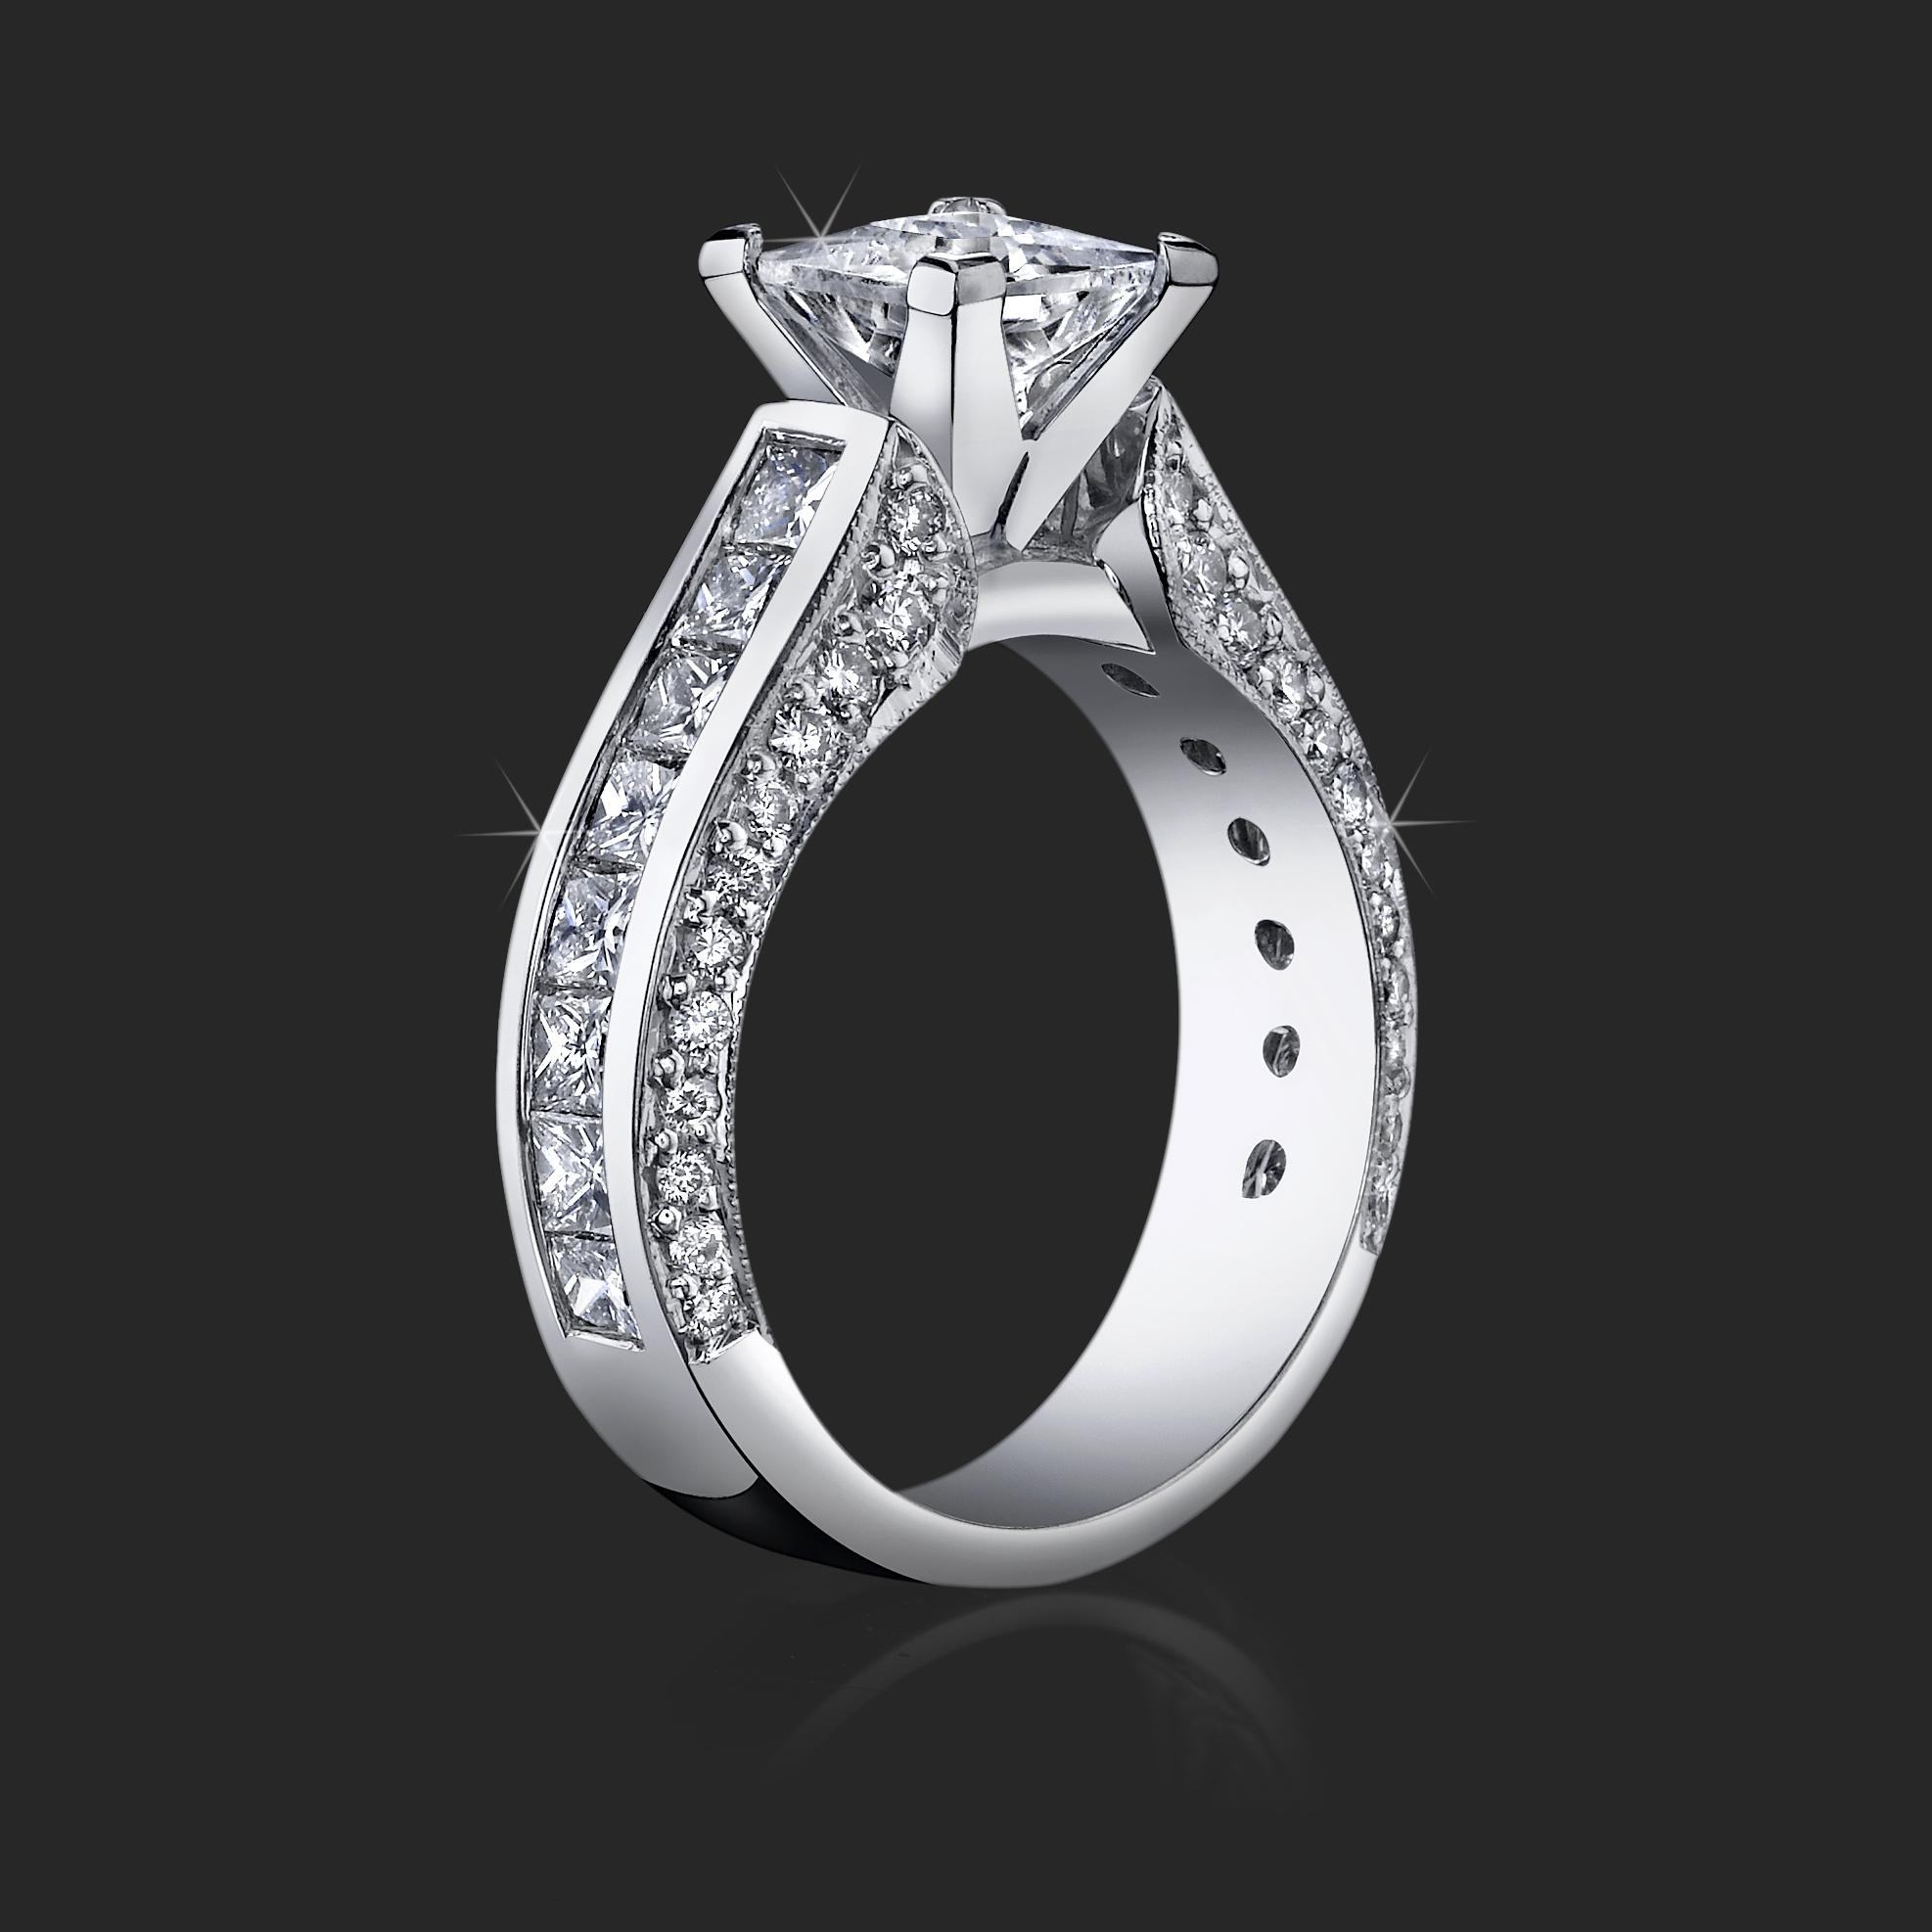 engagement rings by secret paul mn 55113